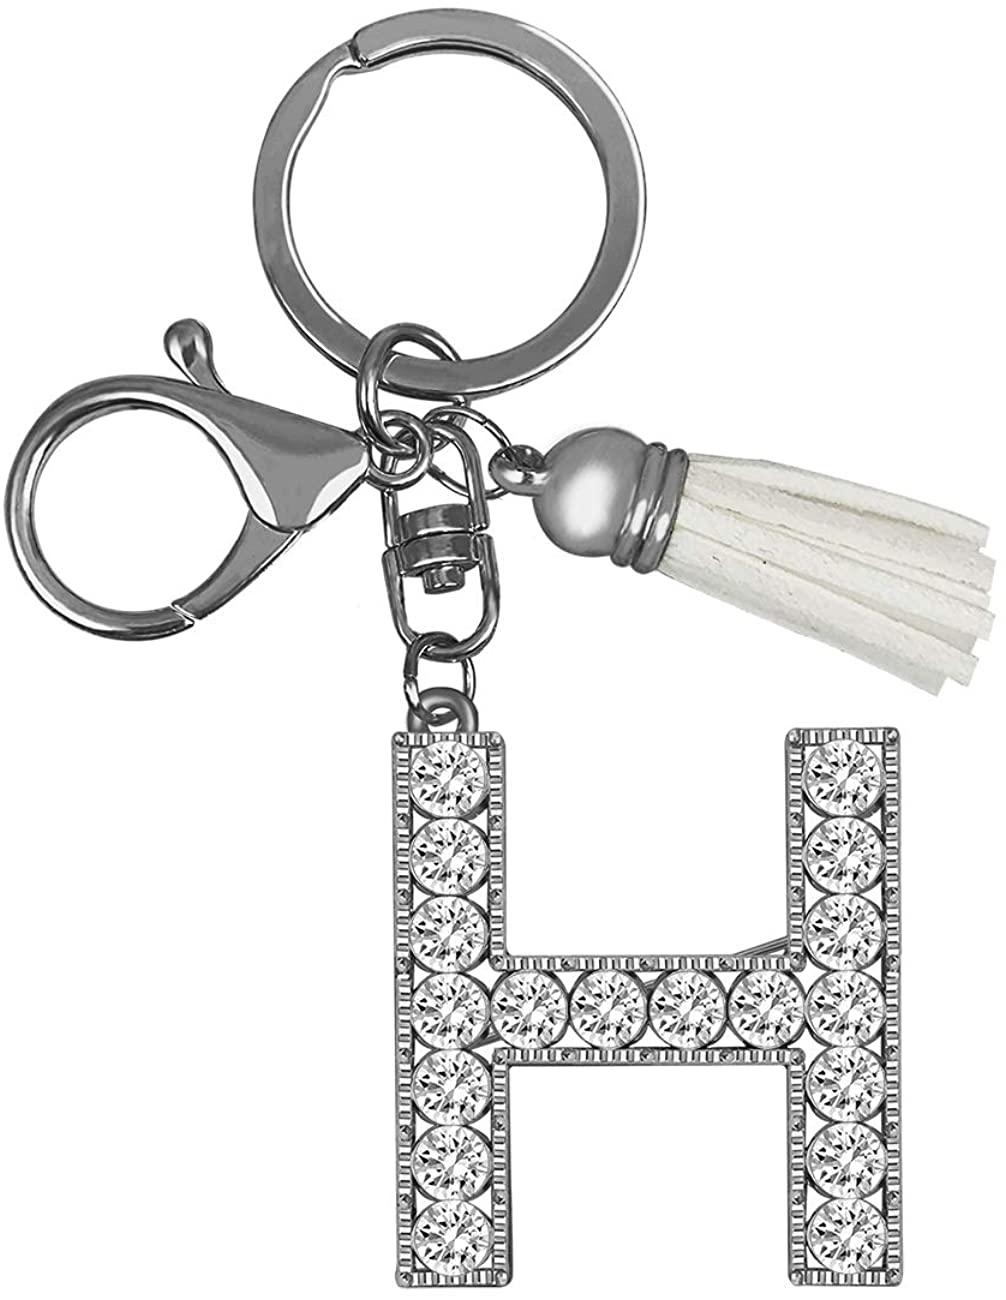 XGALBLA Alphabet Letter(A-Z) Crystal Keychain Sparkling Charm Purse Pendant Handbag Bag Key Ring Friend Gift